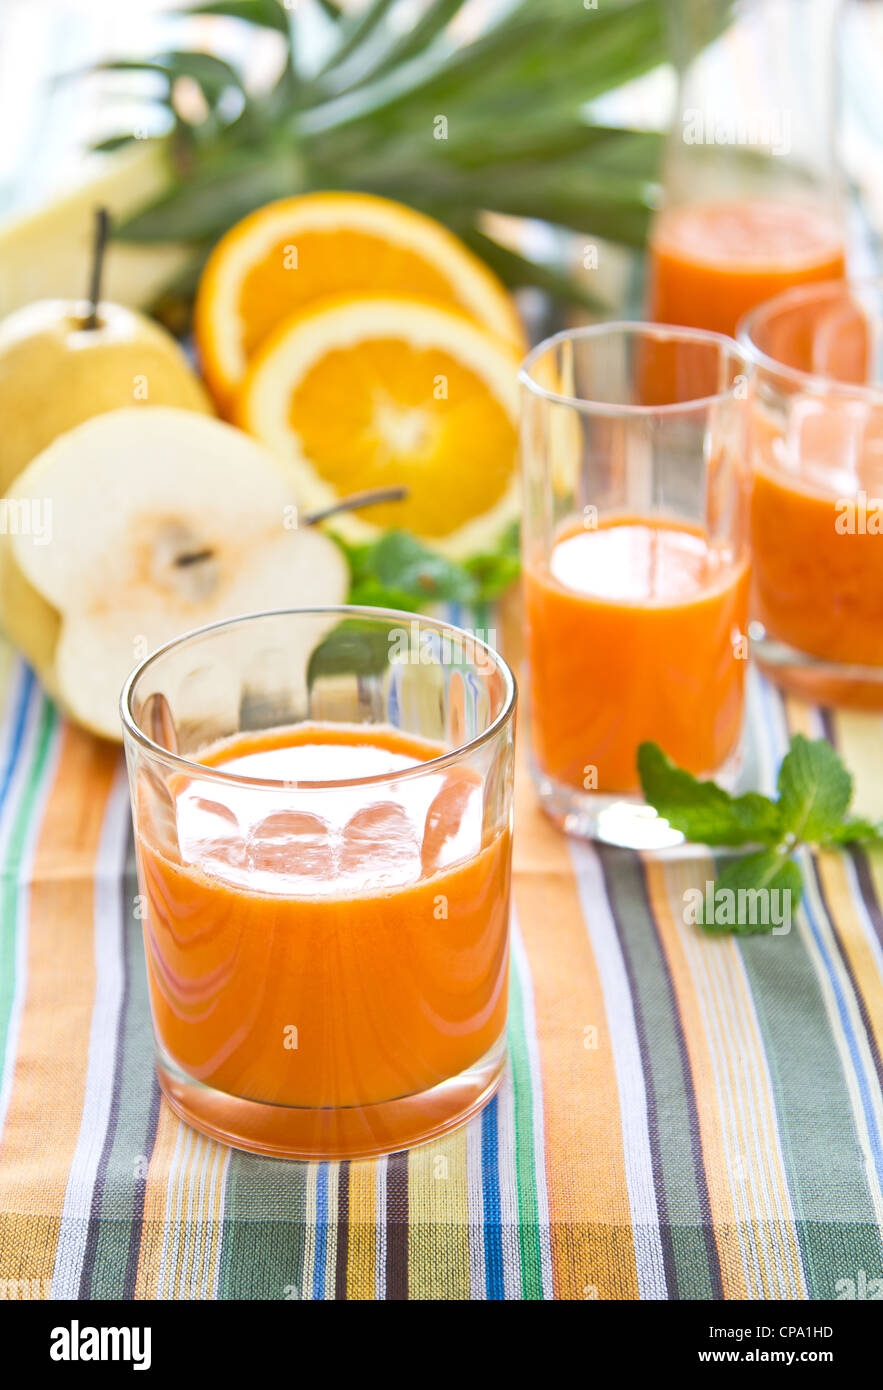 Pera,zanahoria y naranja batido Imagen De Stock